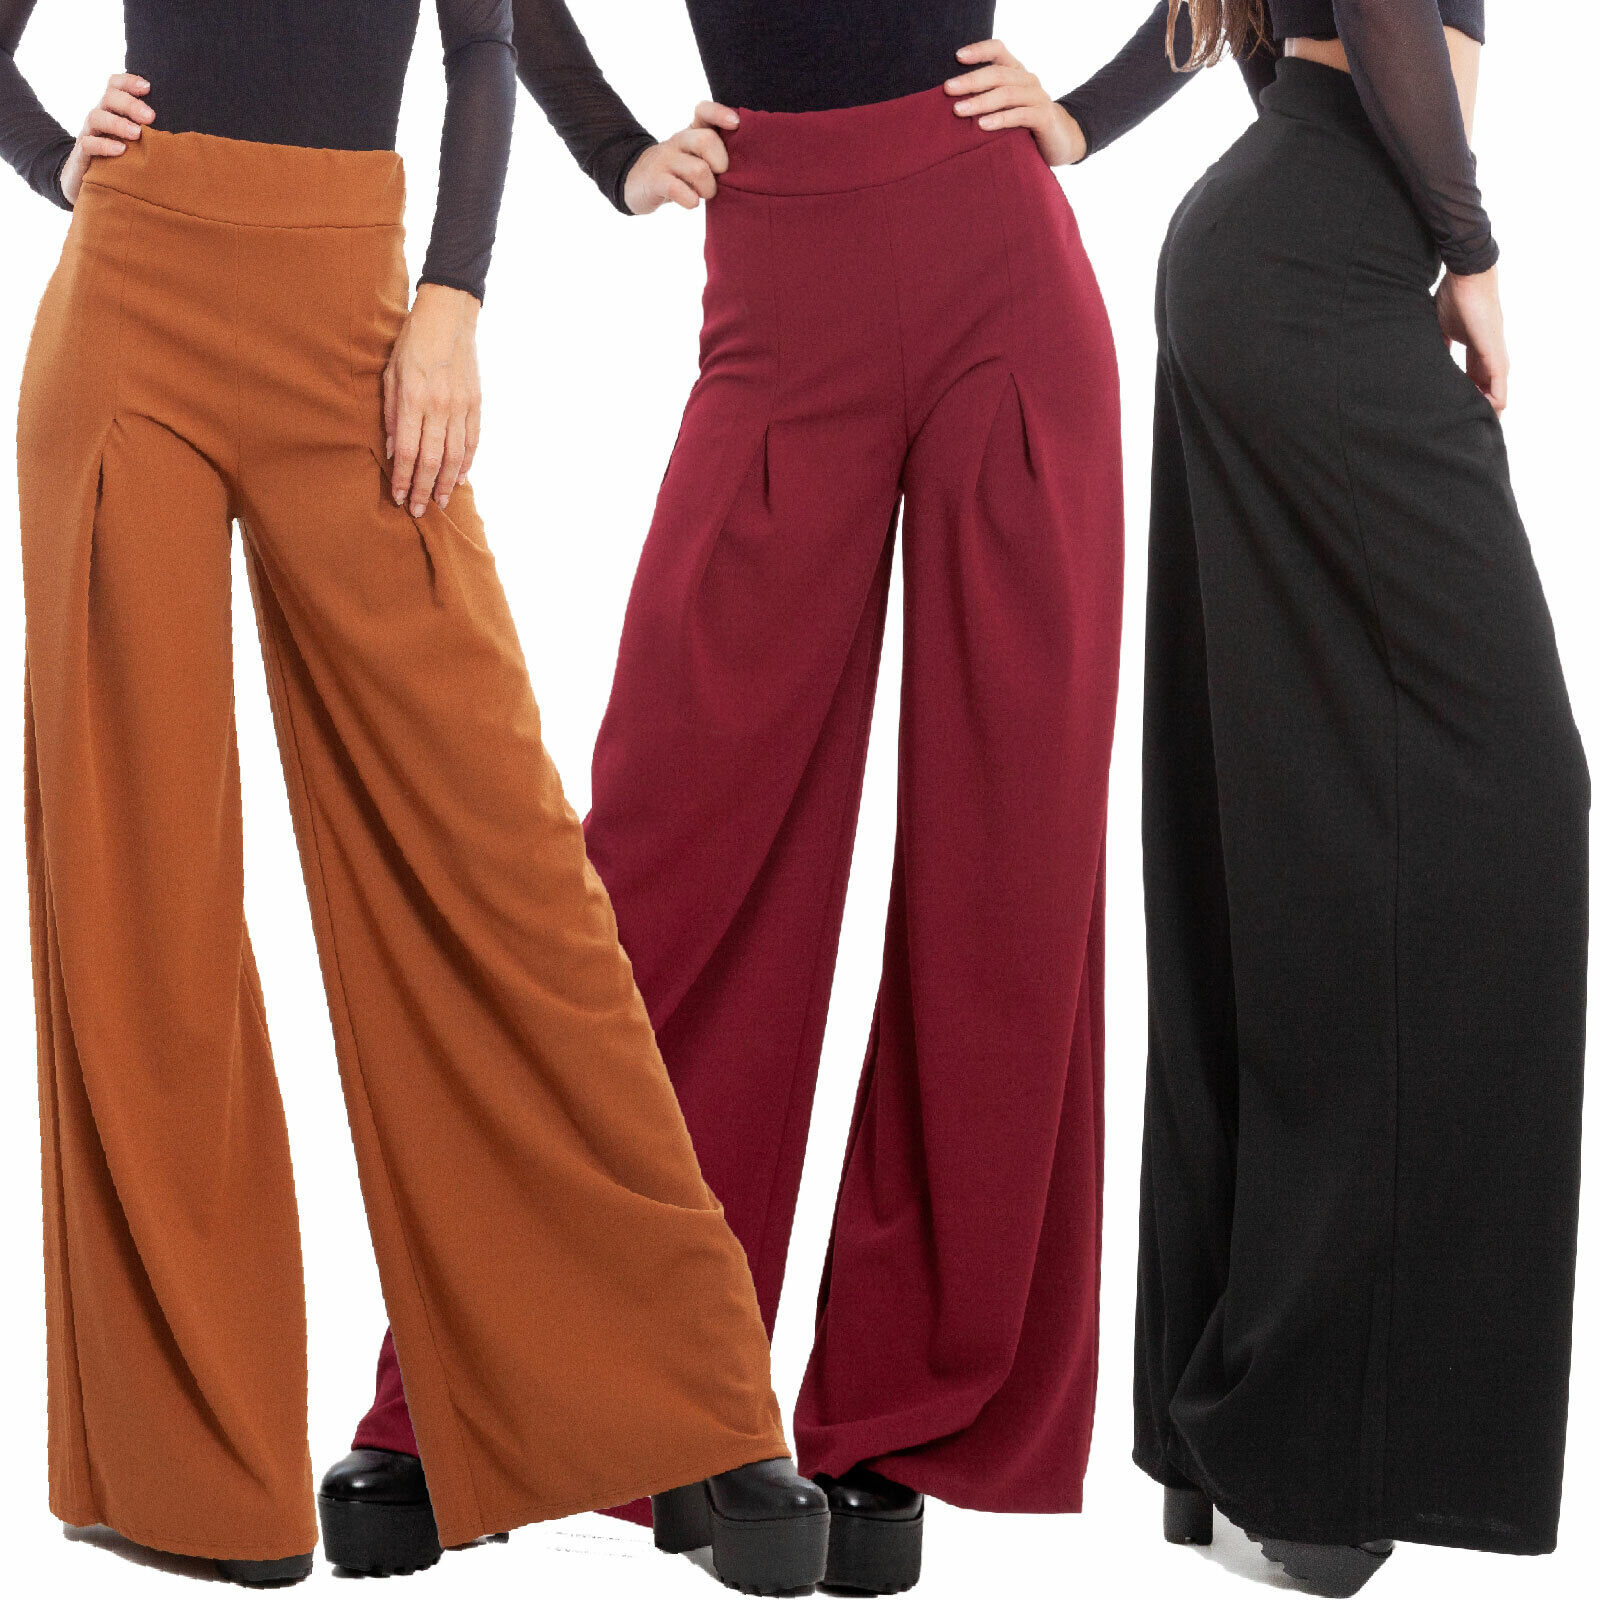 Pantalones Edificio Mujer Elegantes Dart Flare Talle Alto Invierno Toocool Ebay